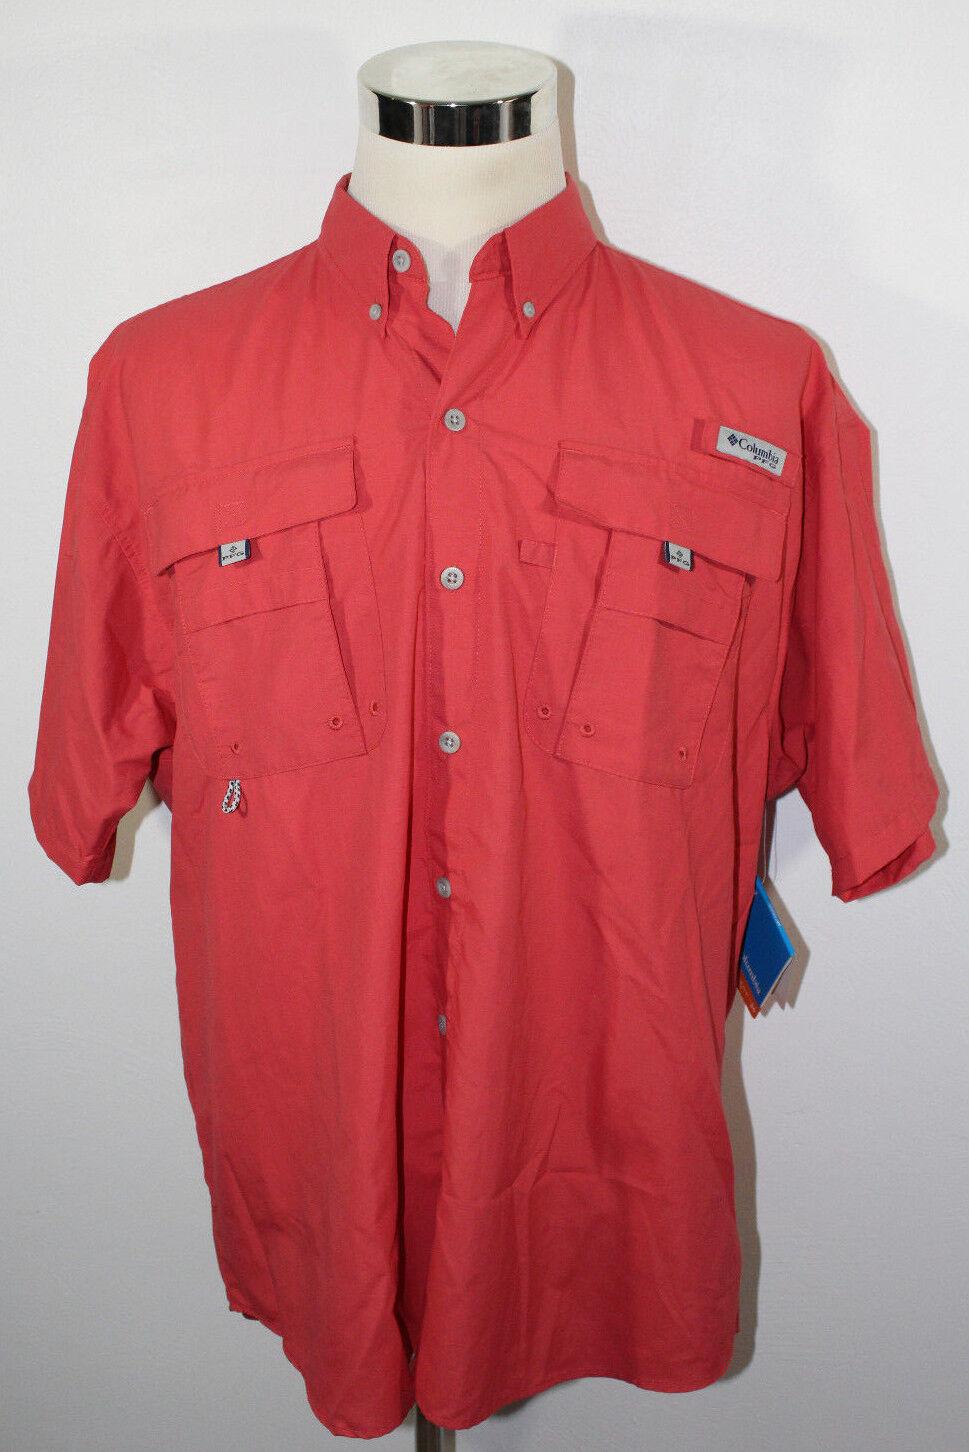 NWT Columbia PFG Performance  Fishing Gear Red Salmon Button Up Shirt Sz Large  enjoy 50% off